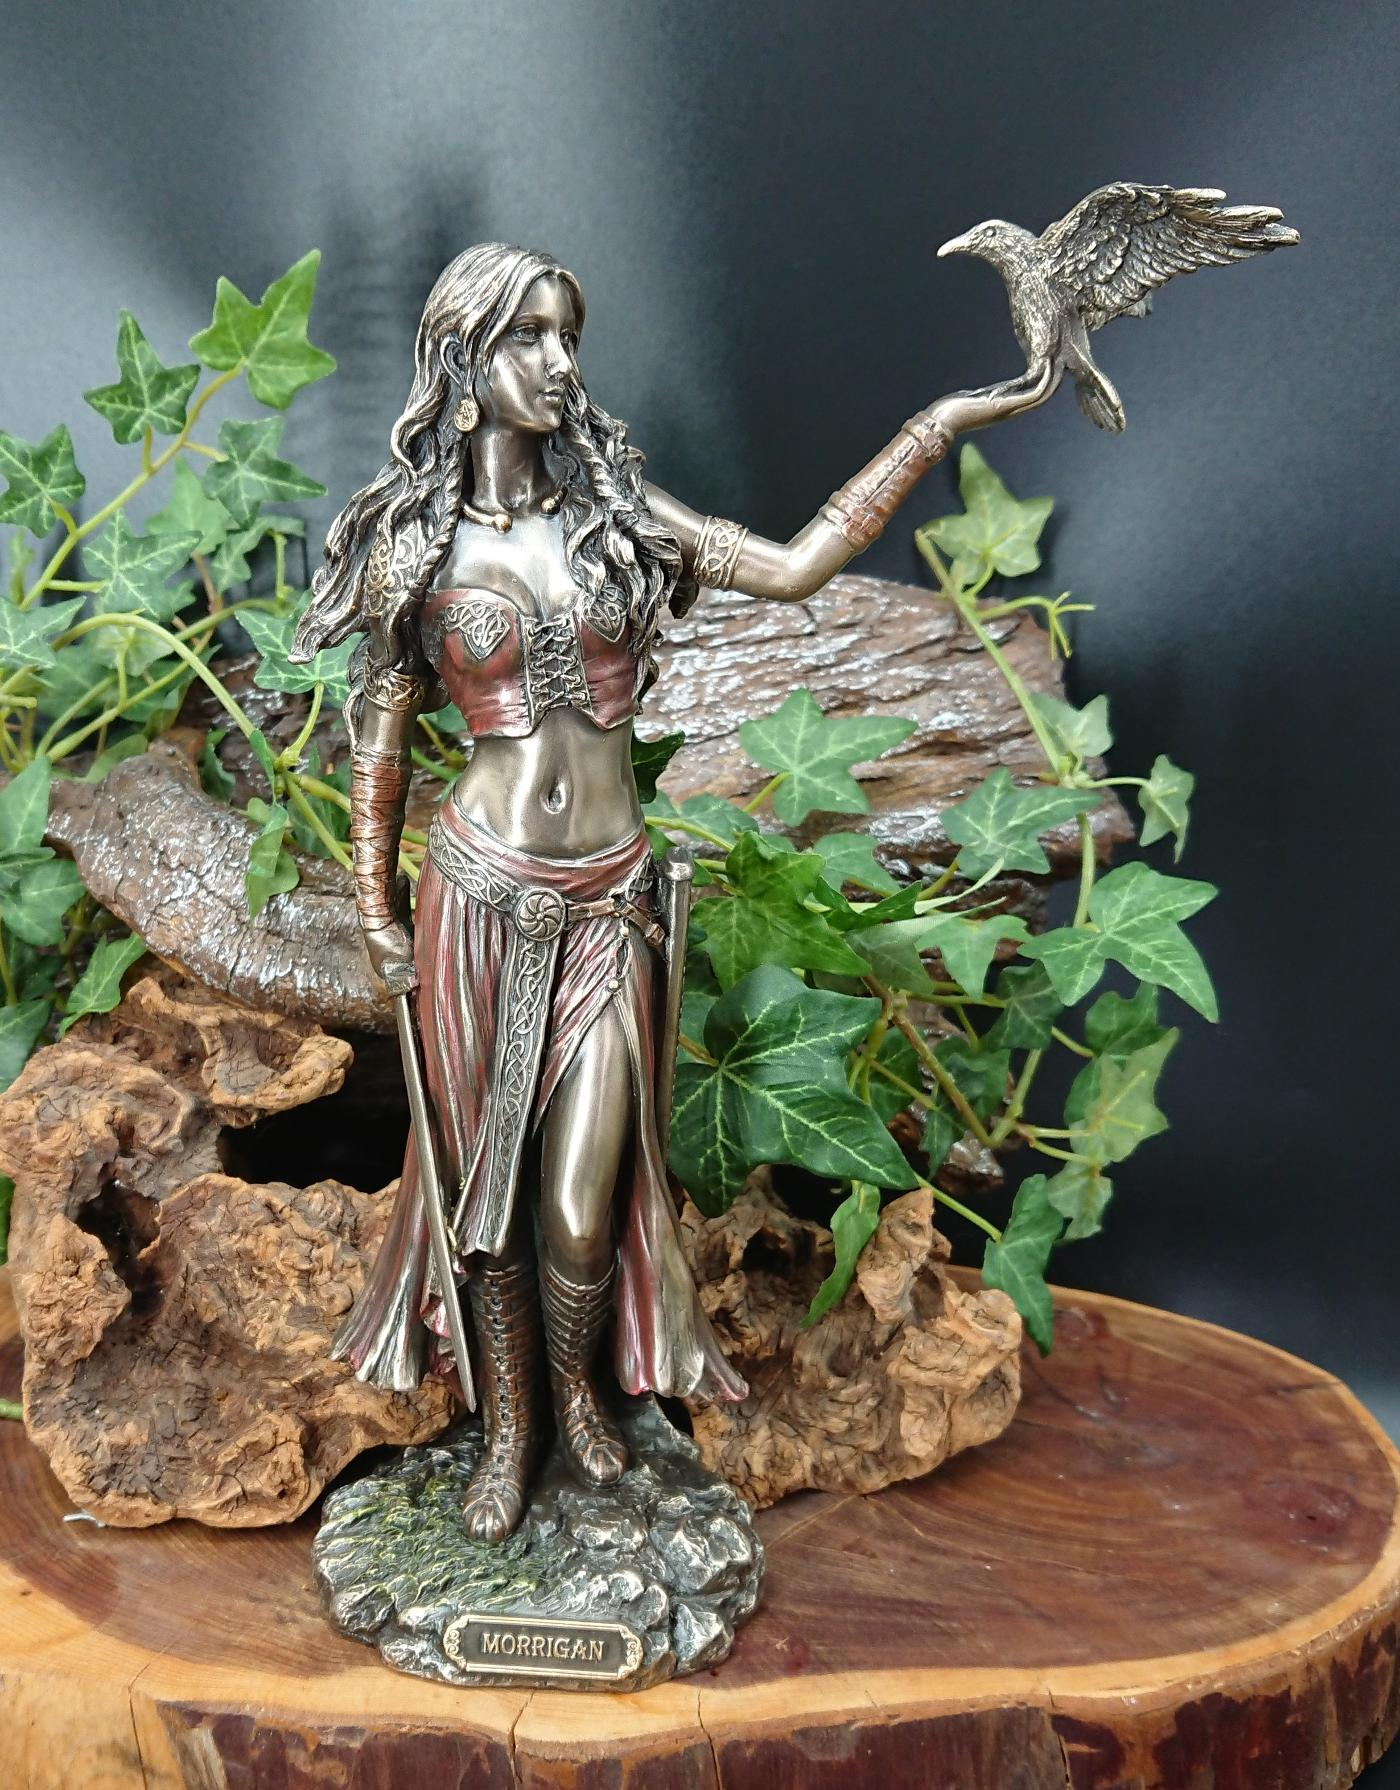 Morrigan and Crow Figurine